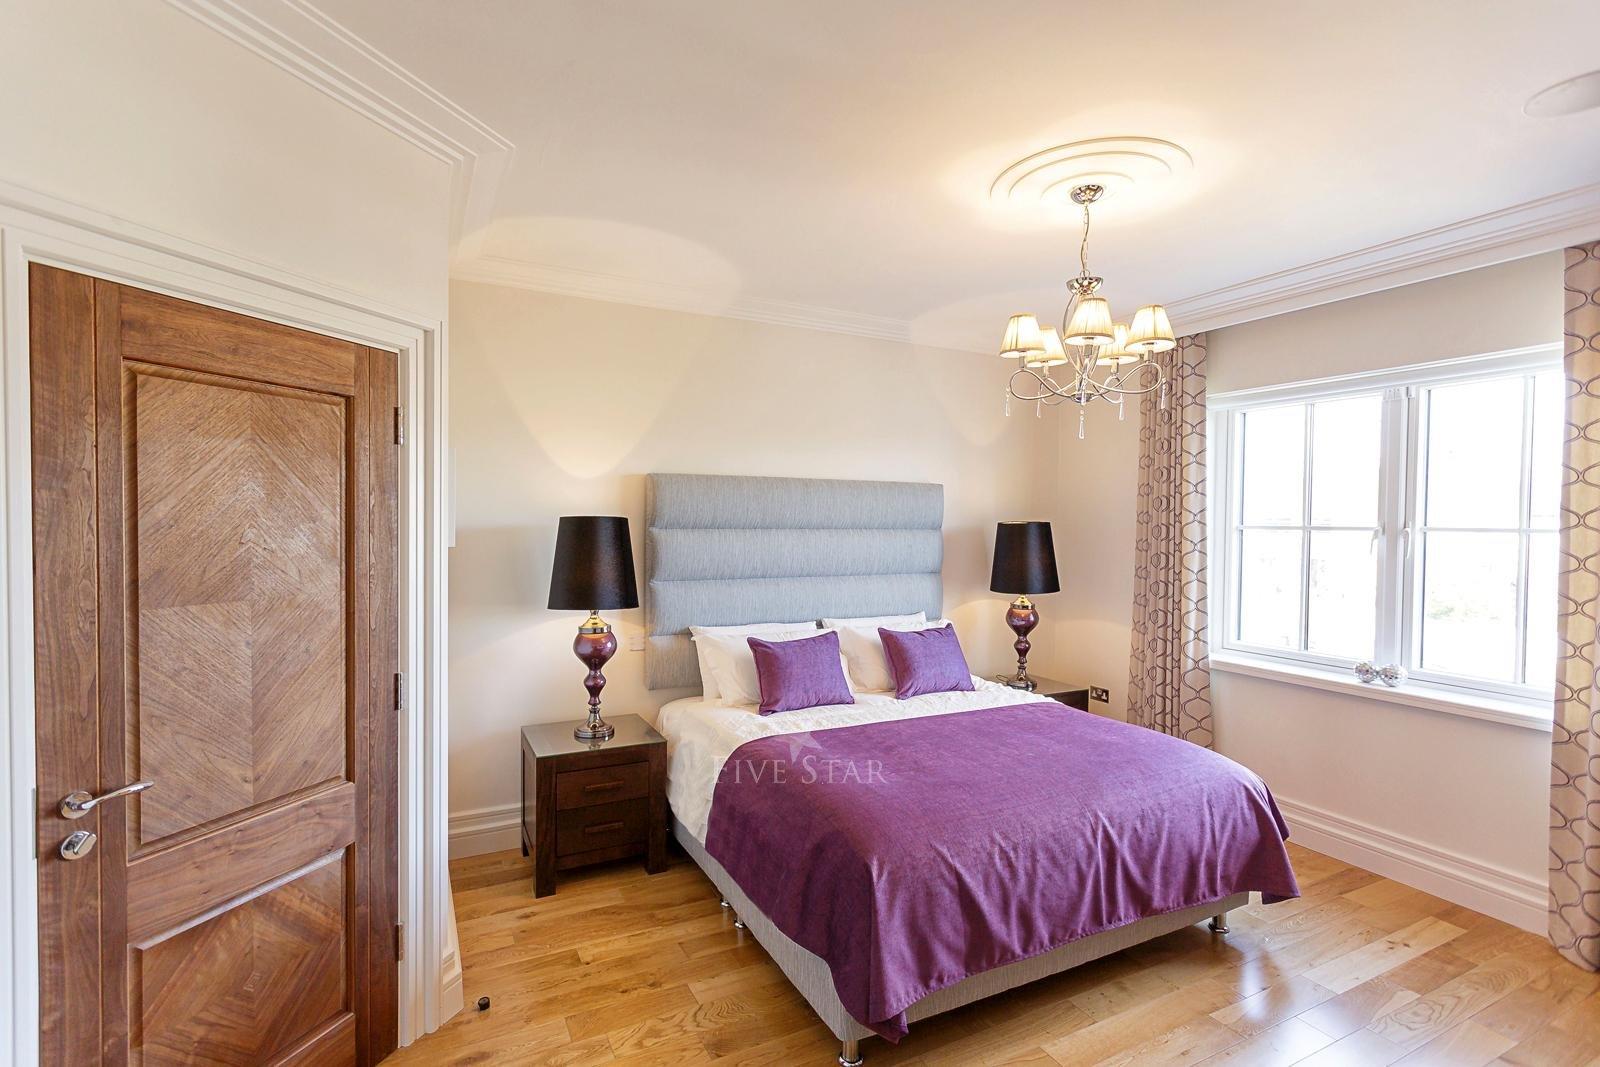 Luxquisite 5-Star Killarney Residence photo 32